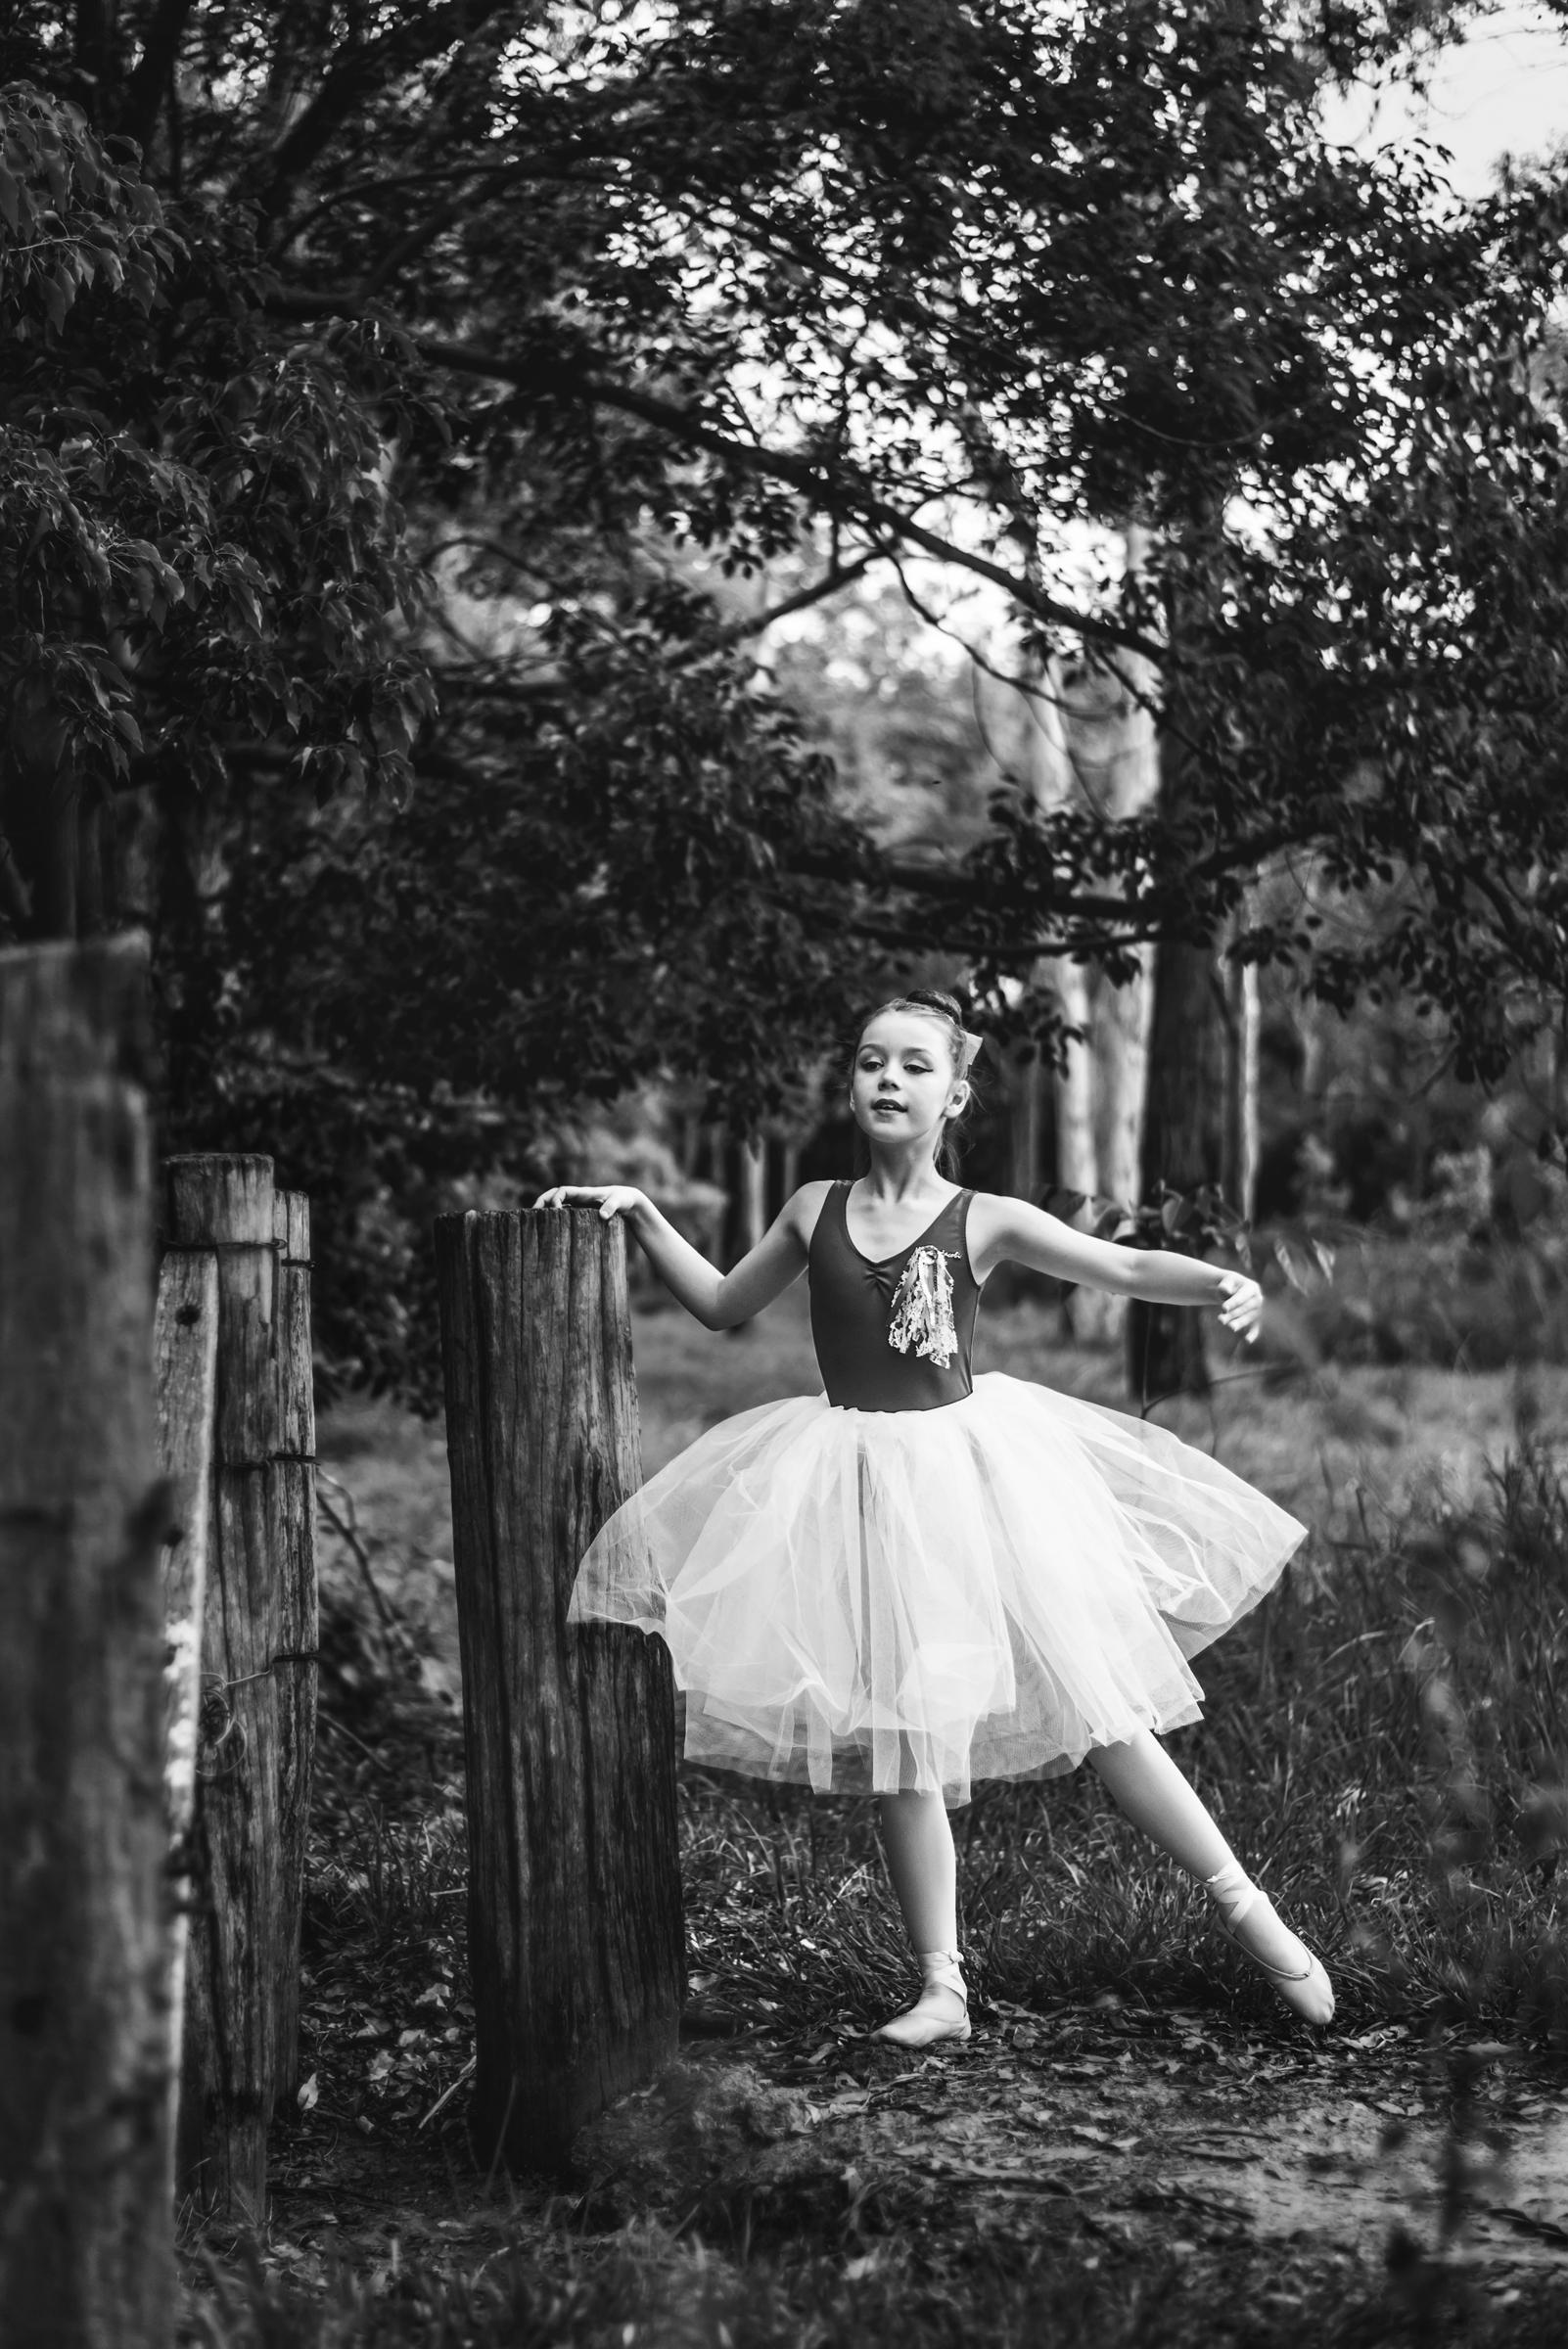 North Brisbane dancer in bush environment